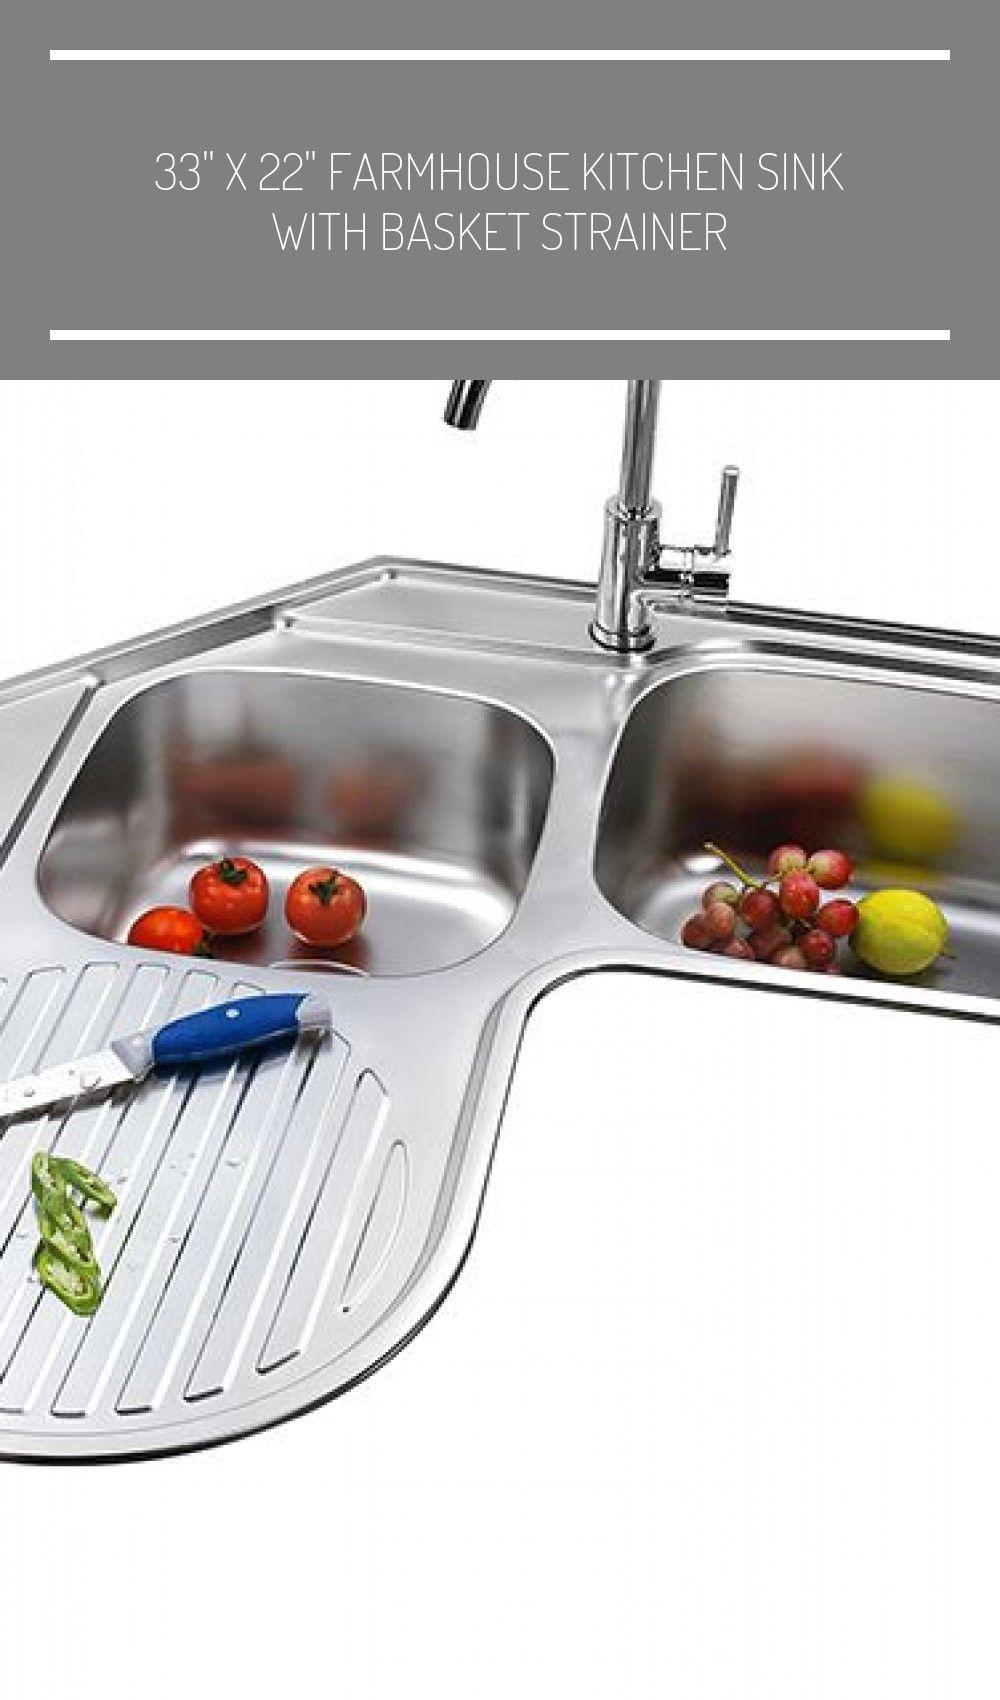 Stainless Steel Corner Sink With Drain Board Buy Multifunctional Corner Sink With Drain Board Double Bowl In 2020 Farmhouse Sink Faucet Sink Single Bowl Kitchen Sink